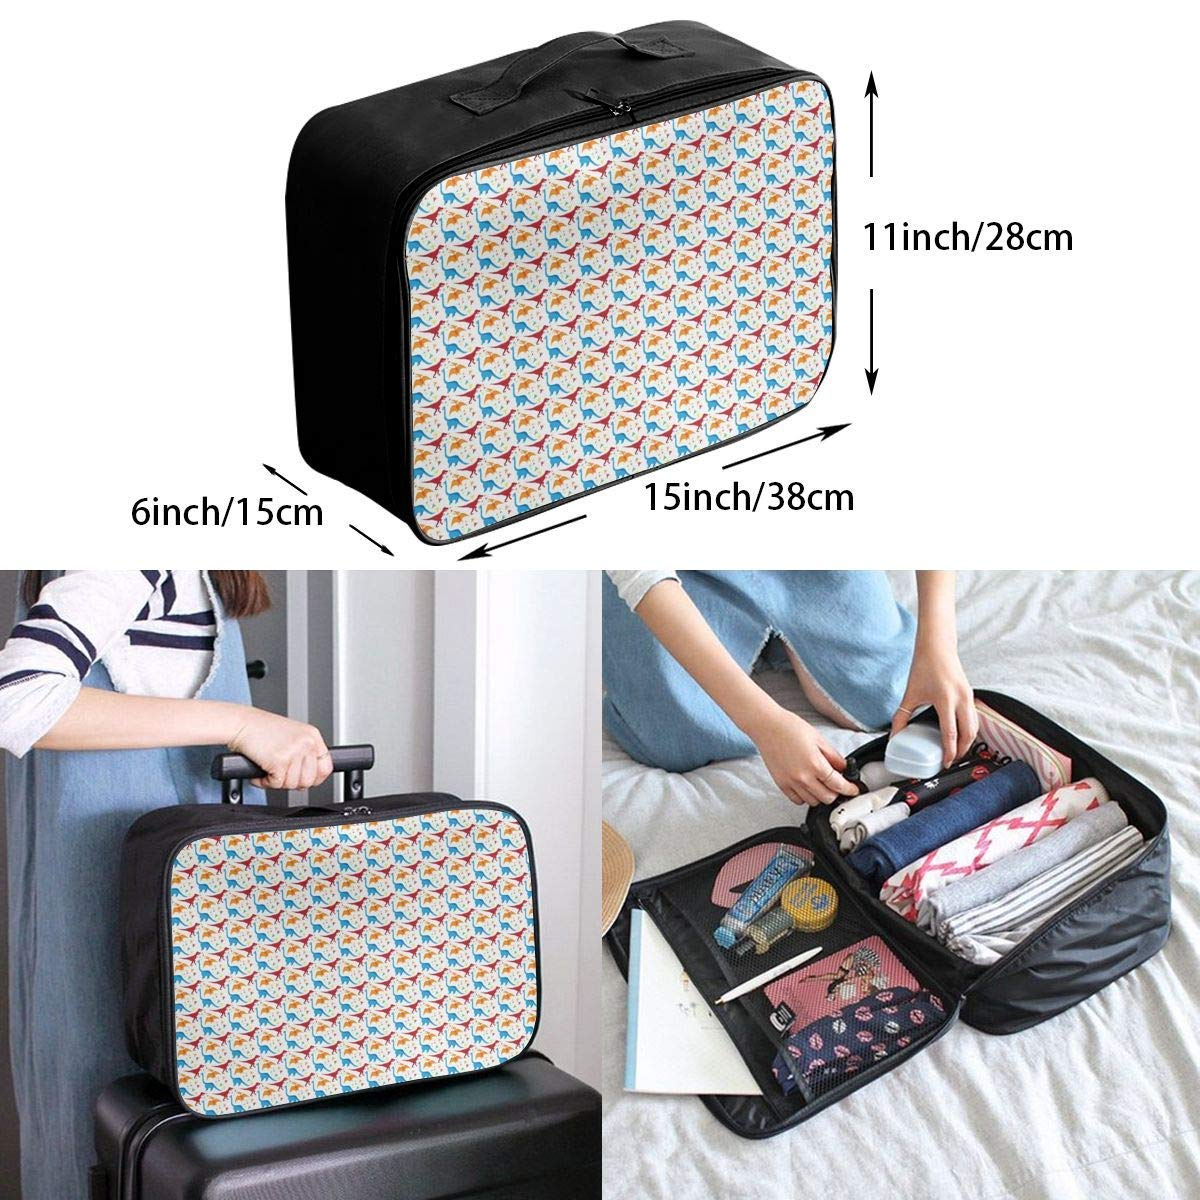 JTRVW Luggage Bags for Travel Dinosaur Colorful Life Travel Duffel Bag Waterproof Fashion Lightweight Large Capacity Portable Duffel Bag for Men /& Women